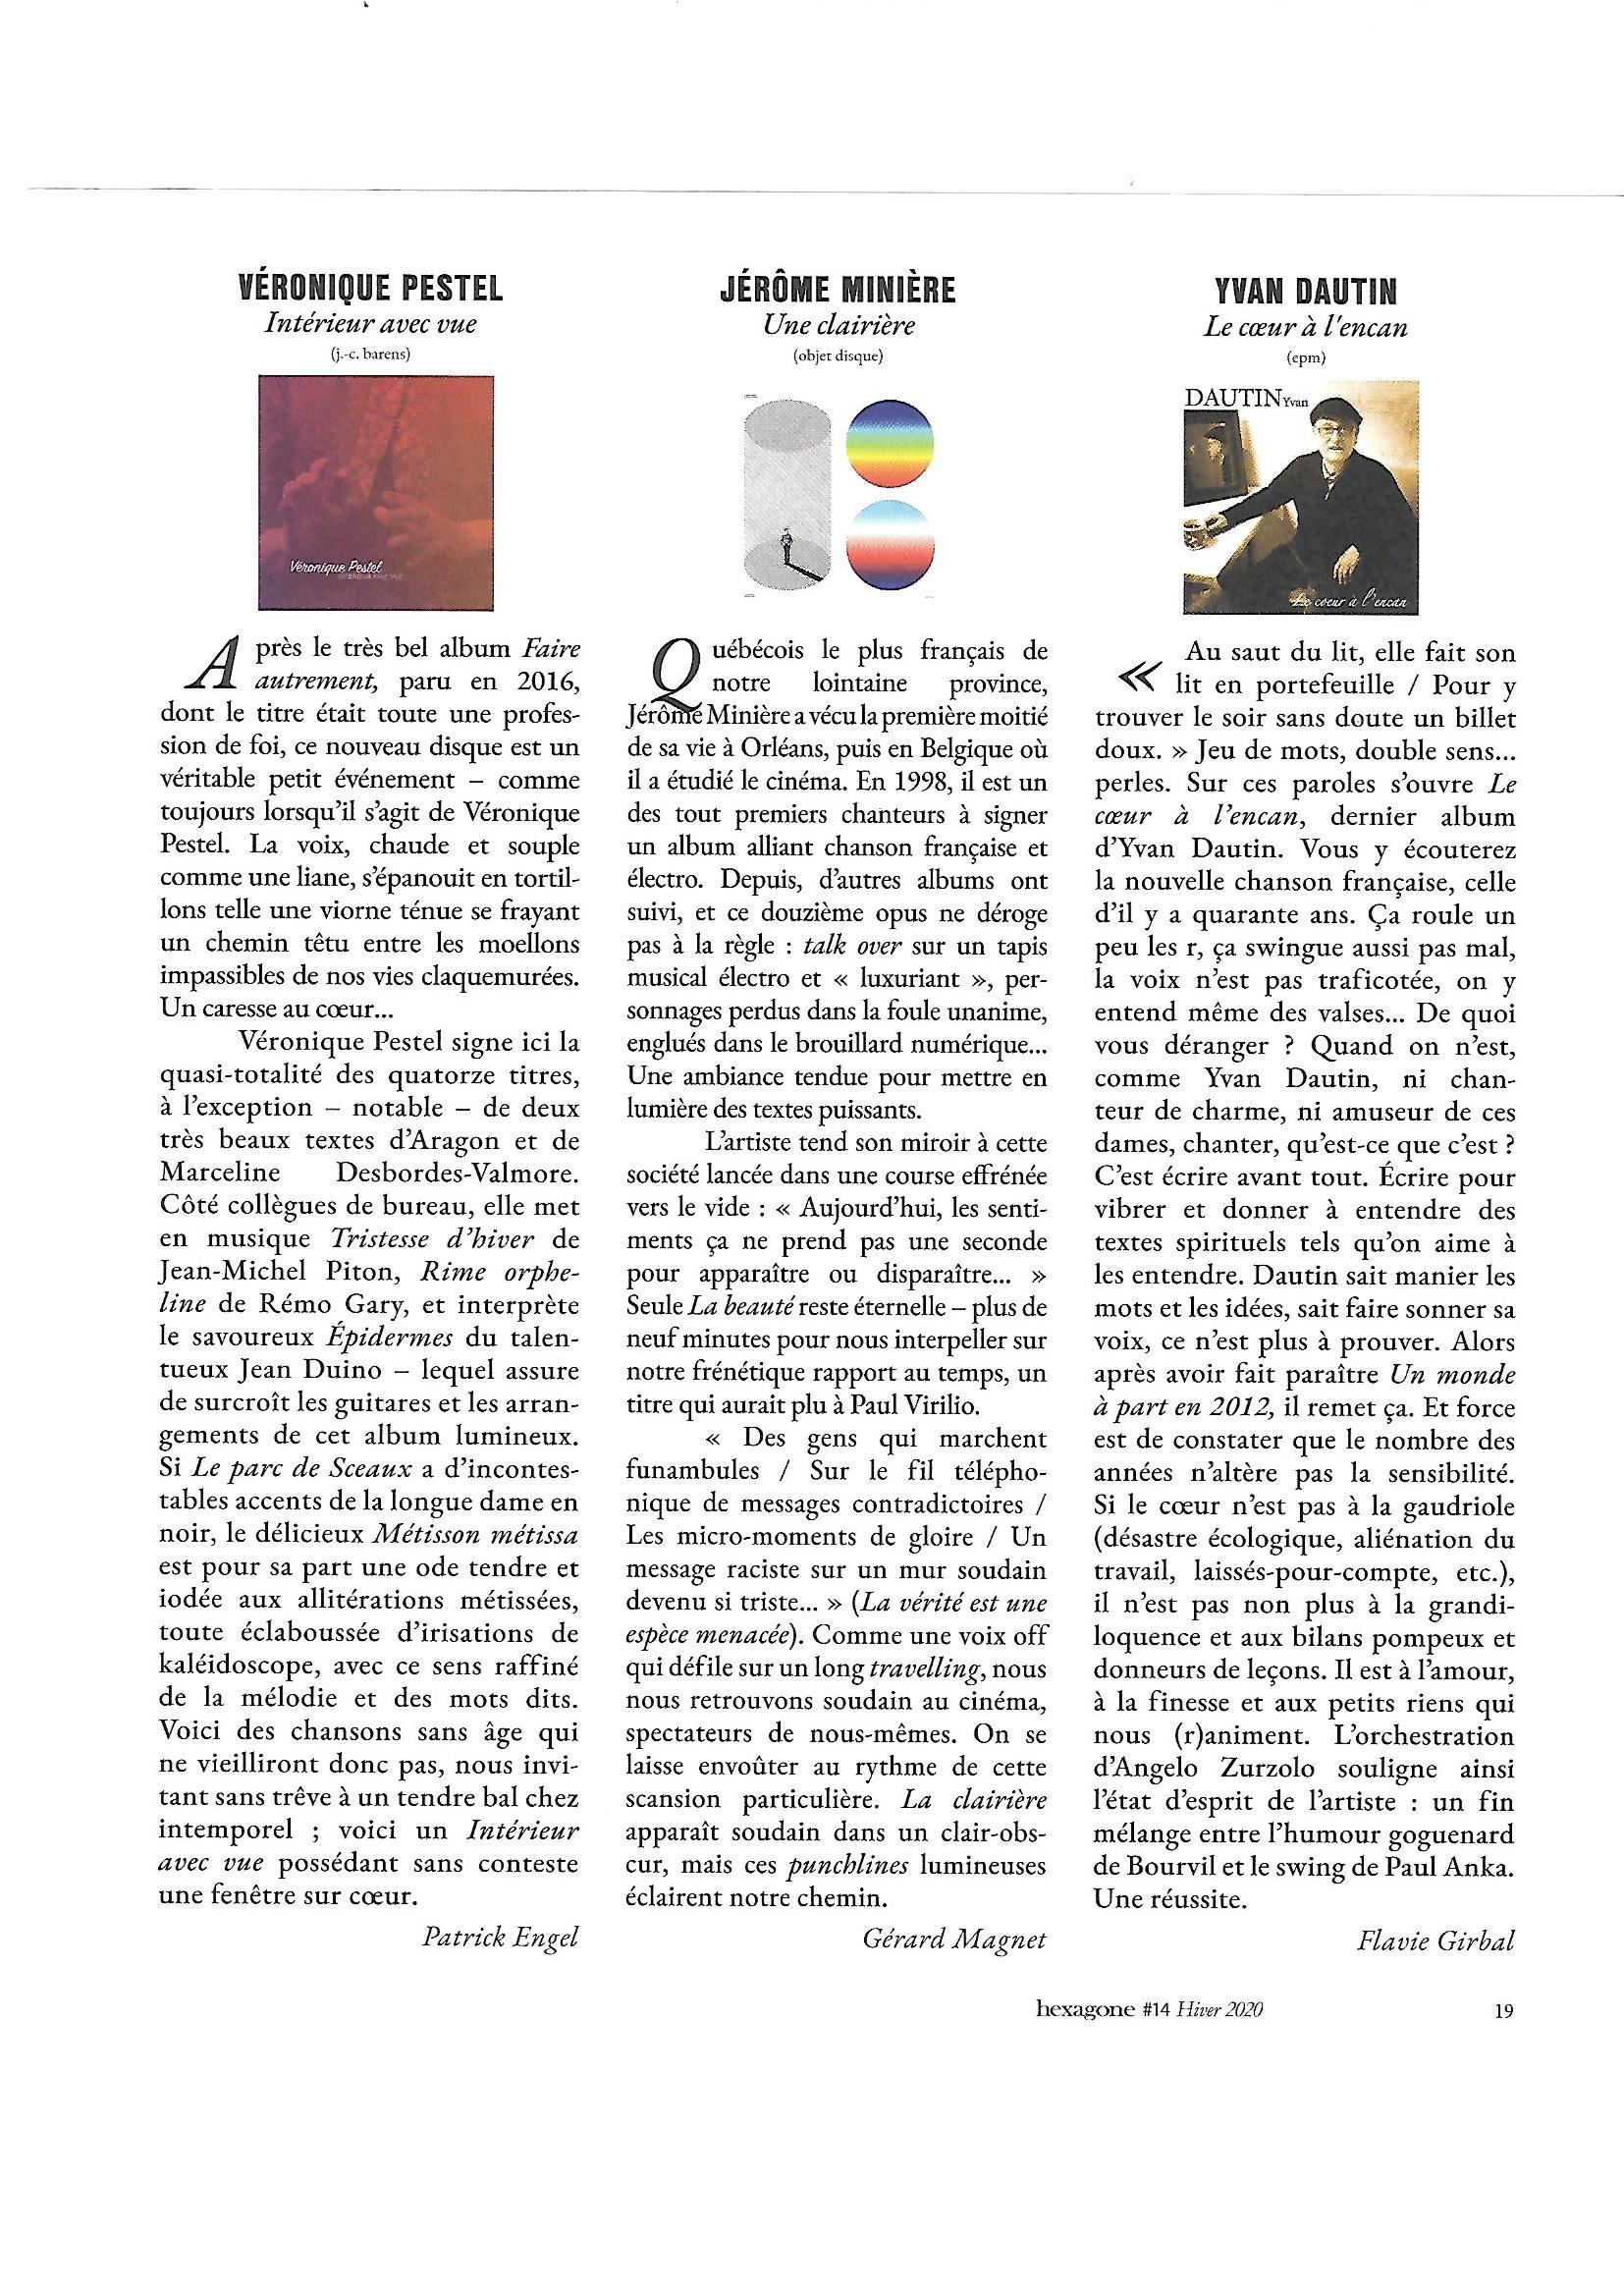 Article de Patrick ENGEL, Hexagone Hiver 2020